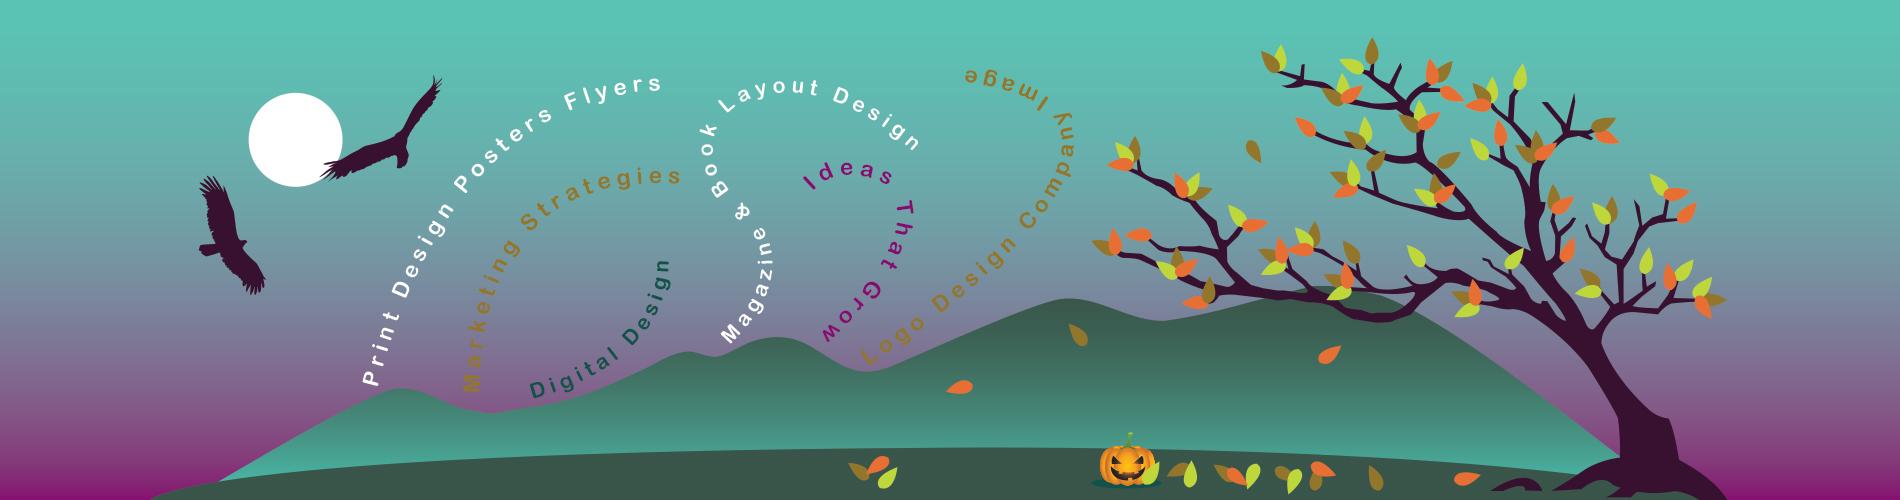 Need a Graphic Designer?